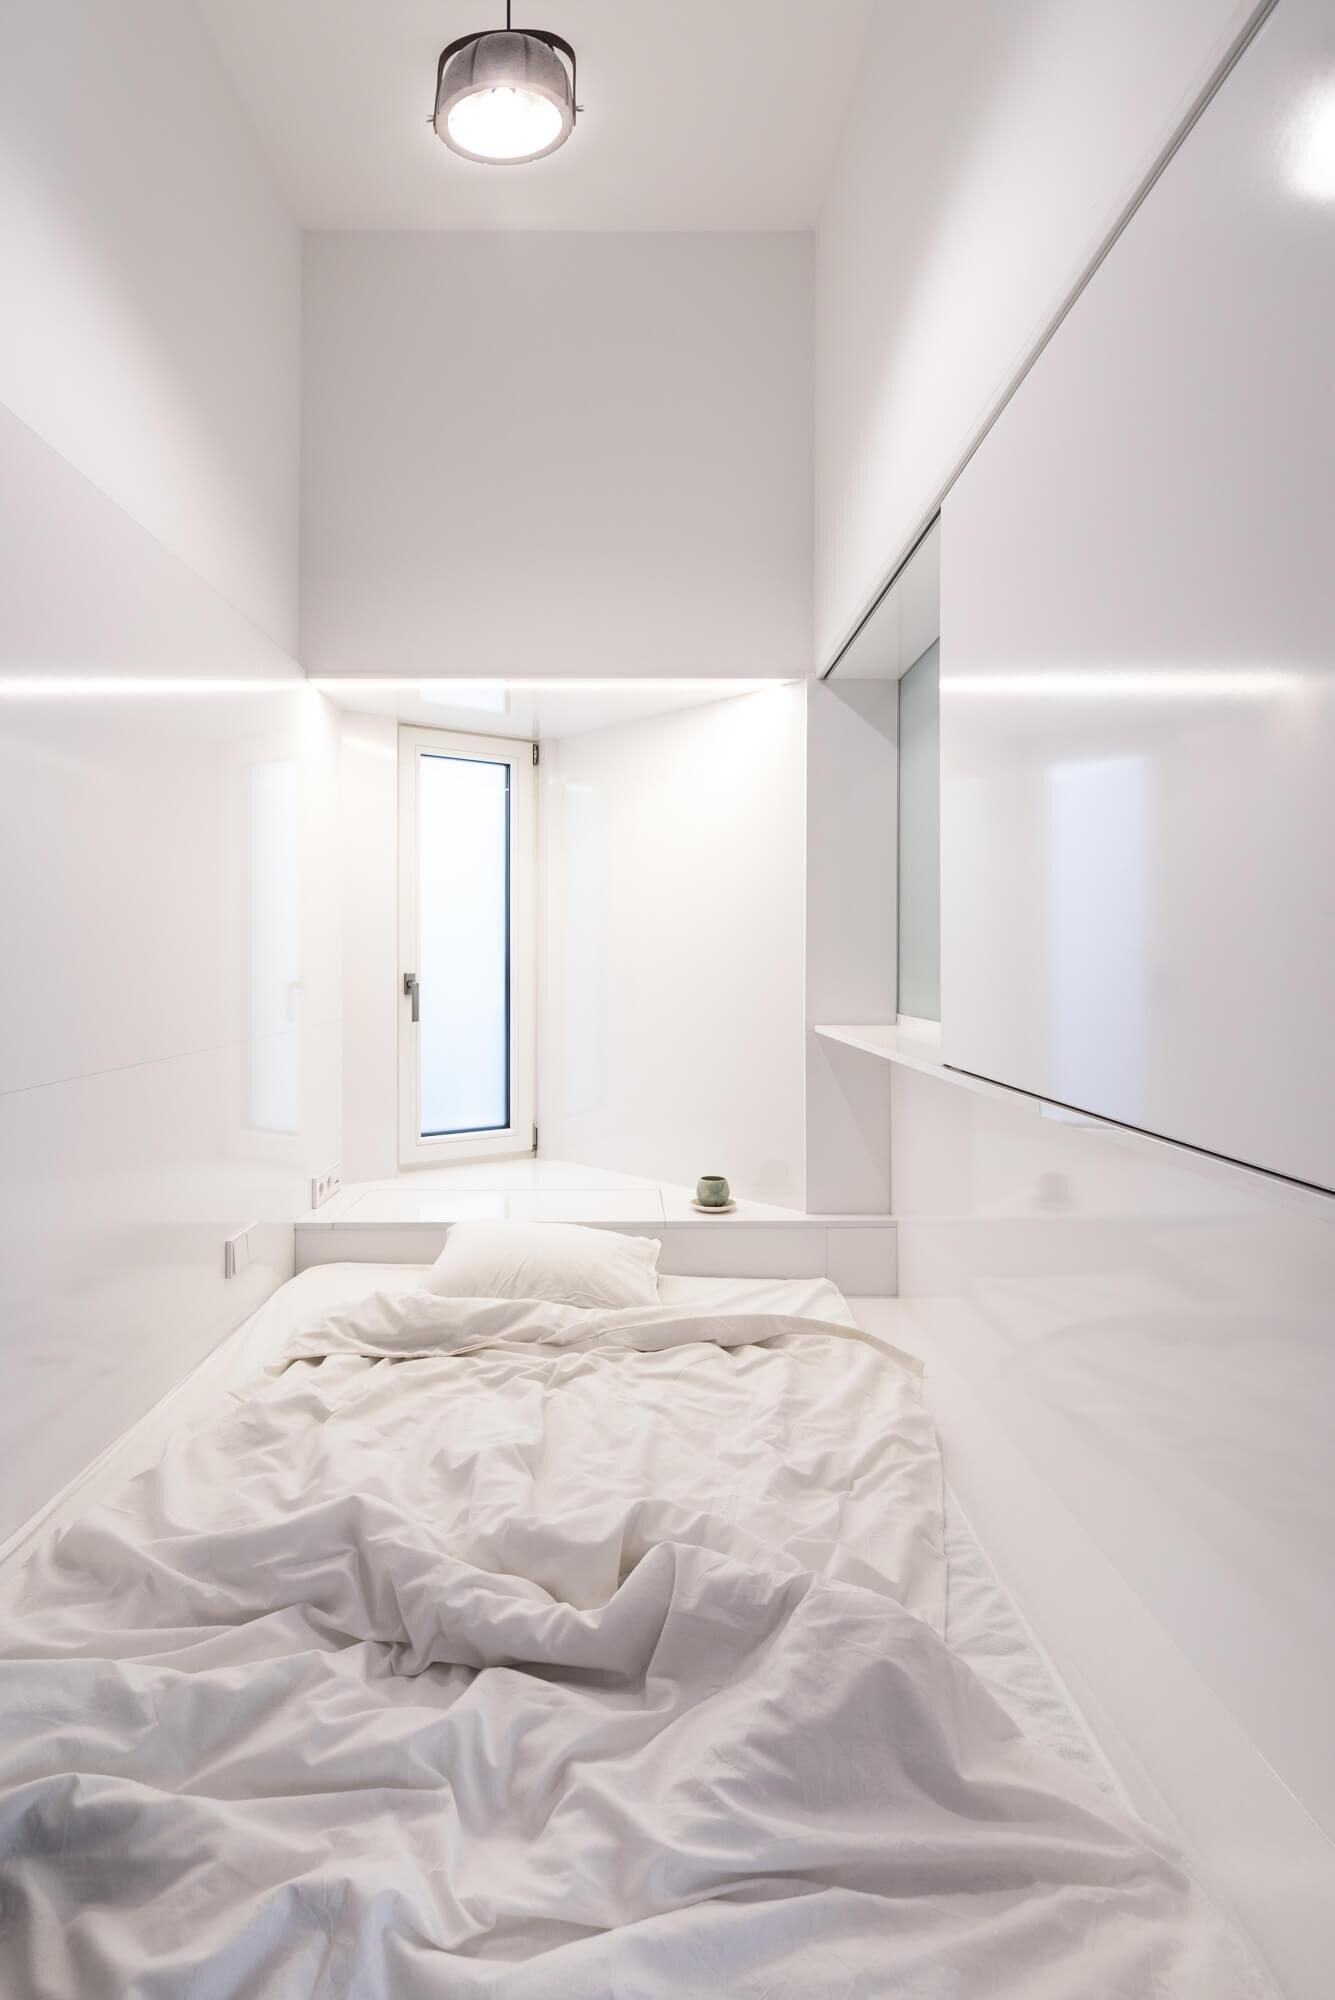 Translucent-spaces-batlab-architects-Hungary-2